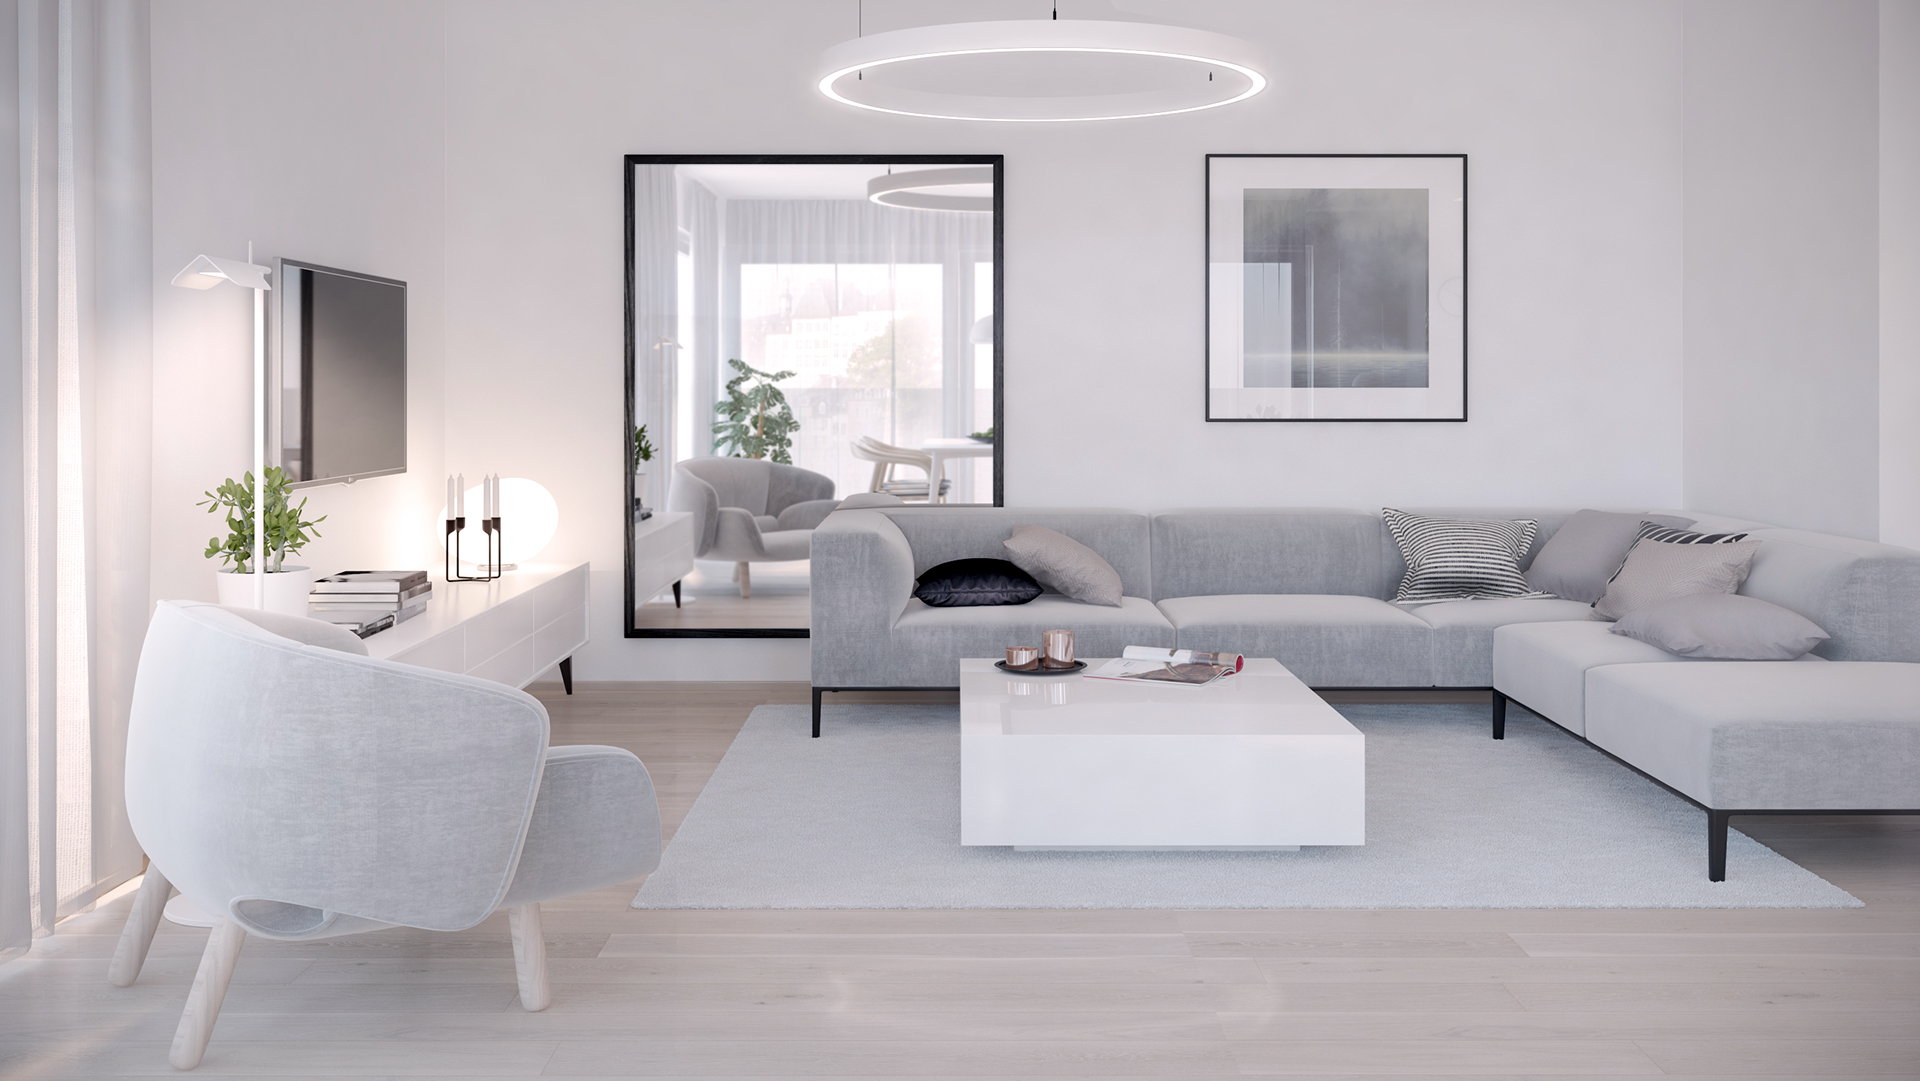 HOW TO CREATE A SLEEK YET PRACTICAL MODERN MINIMALIST LIVING ROOM...